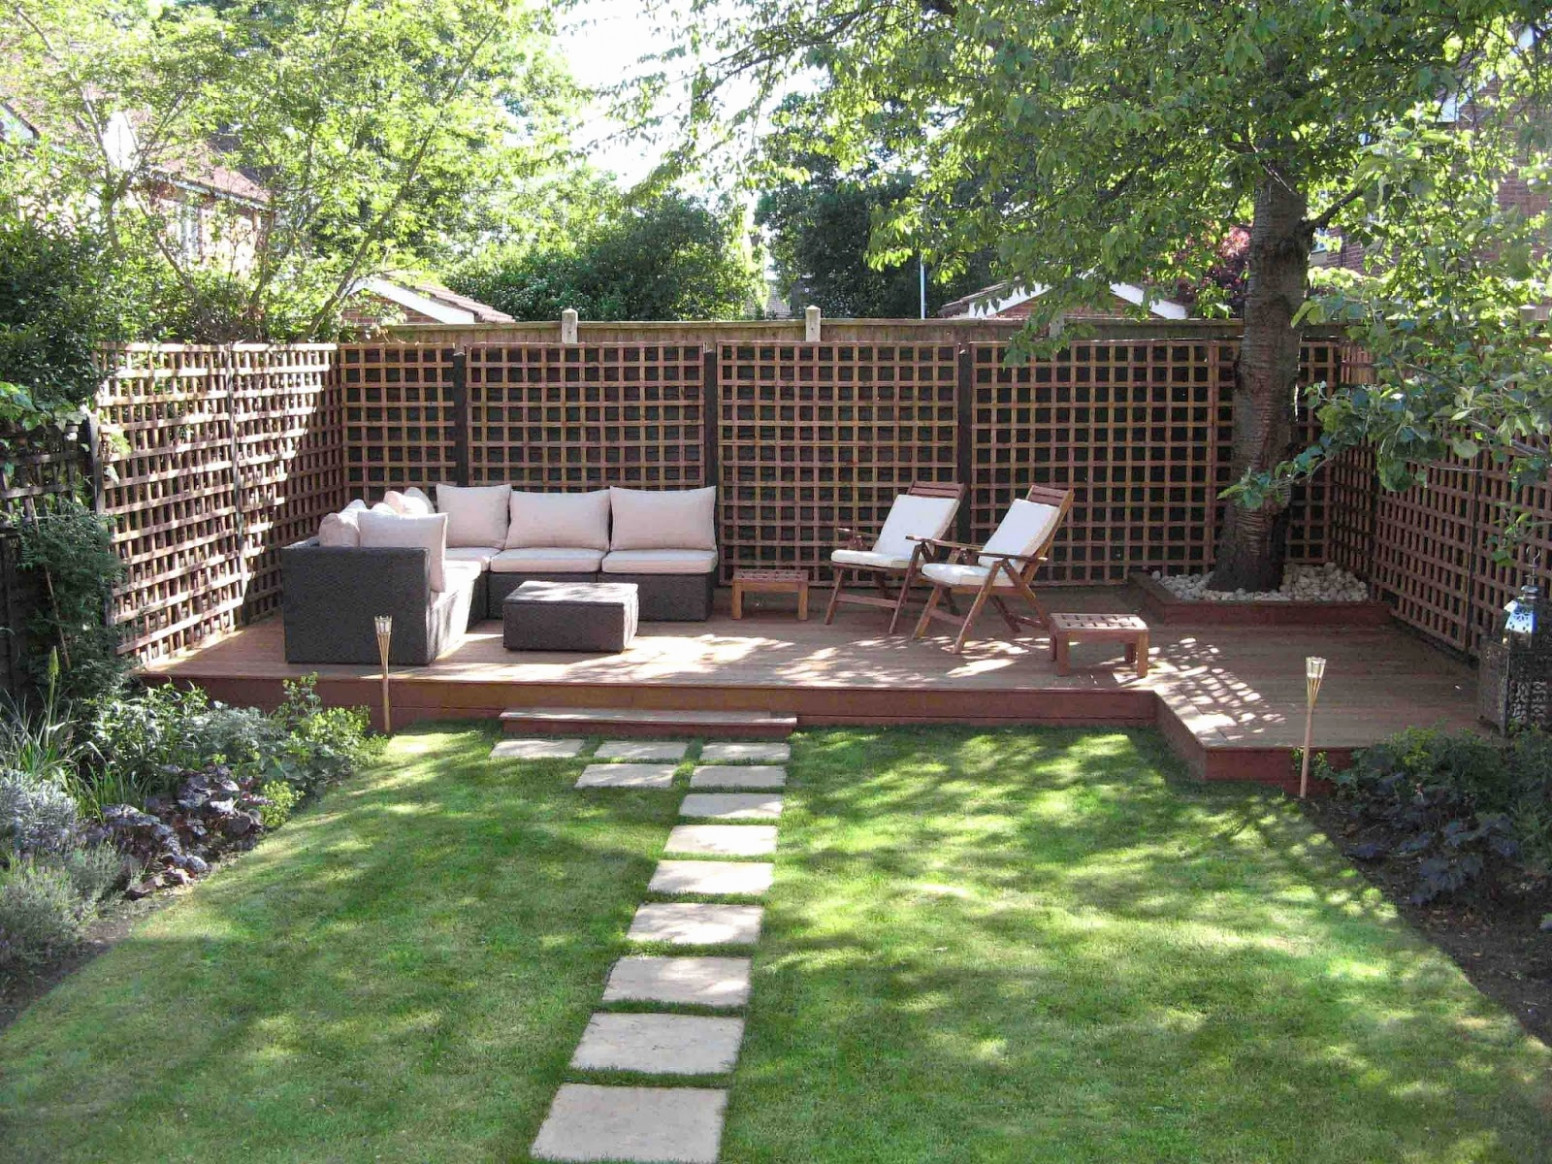 comment r ussir facilement votre am nagement de jardin. Black Bedroom Furniture Sets. Home Design Ideas